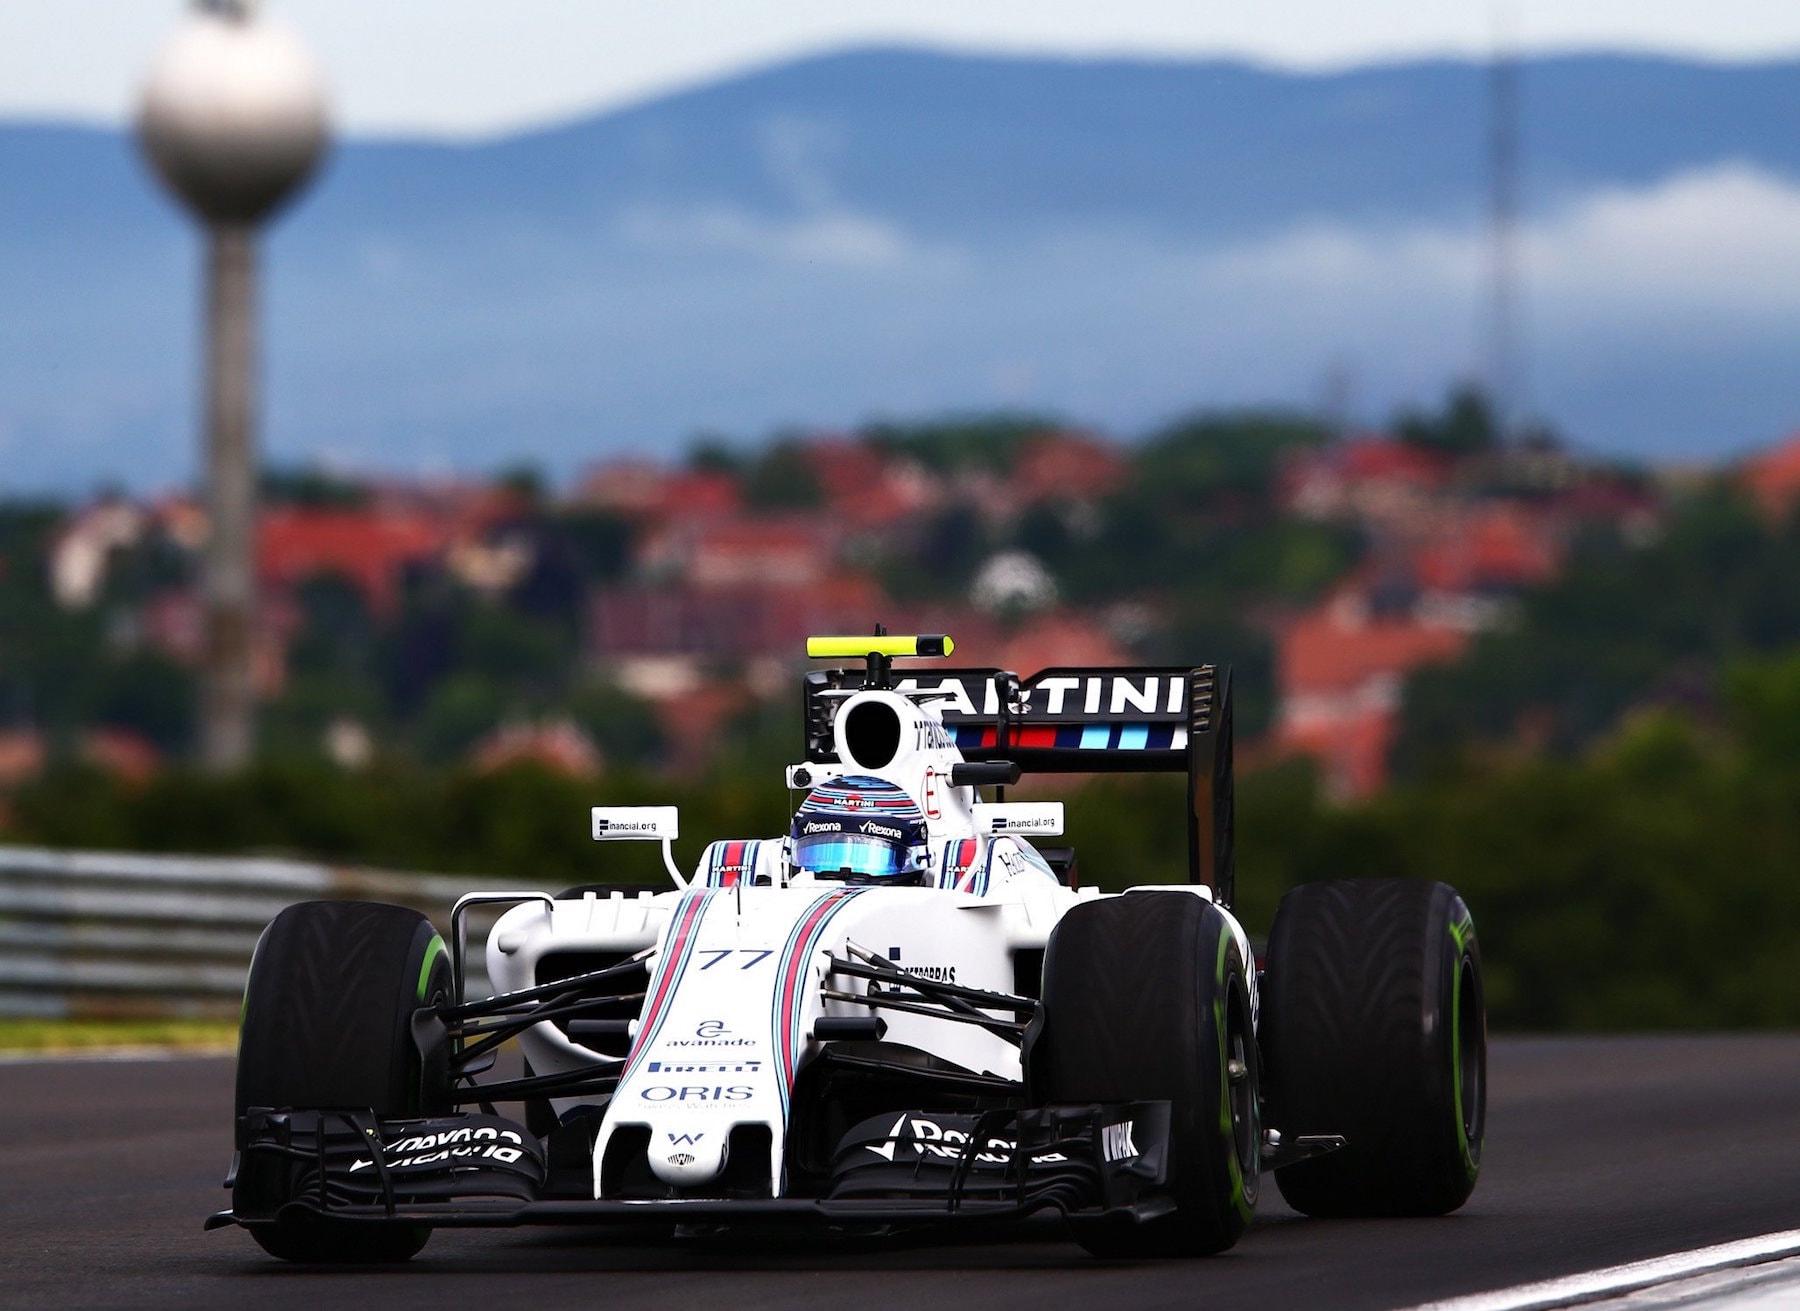 Salracing | Valtteri Bottas | Williams Martini Racing